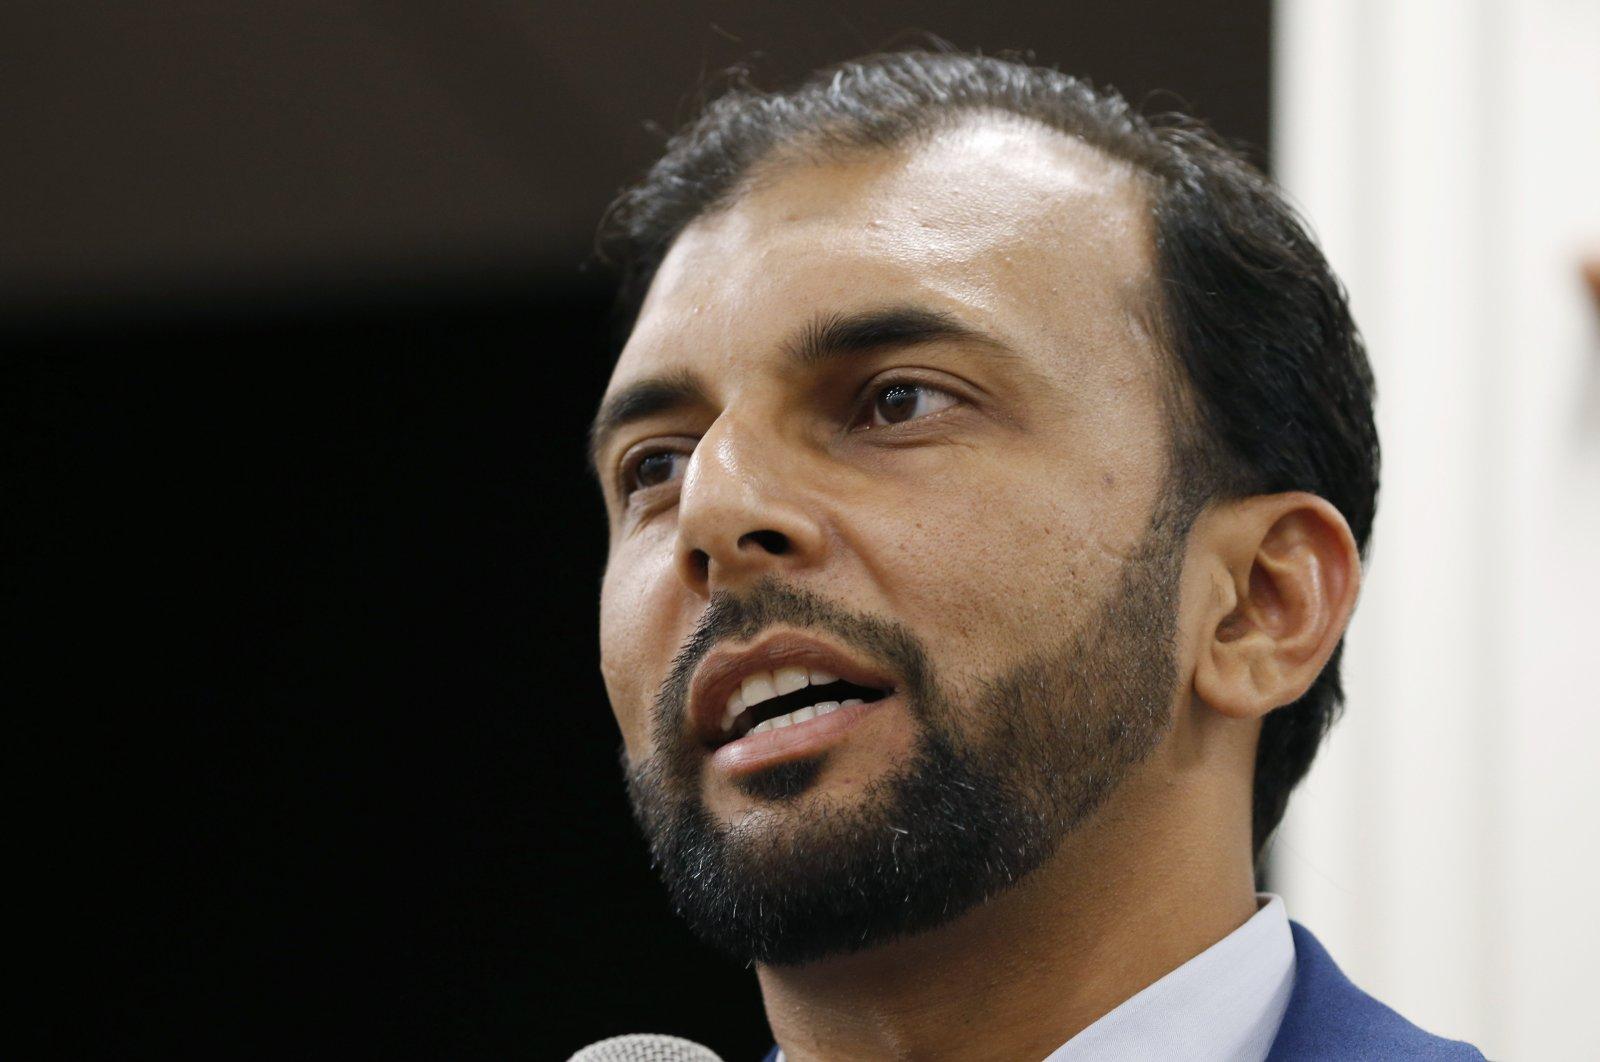 Democratic candidate for the 28th district for the Virginia Senate, Qasim Rashid, in Fredericksburg, Va., Oct. 8, 2019. (AP Photo)